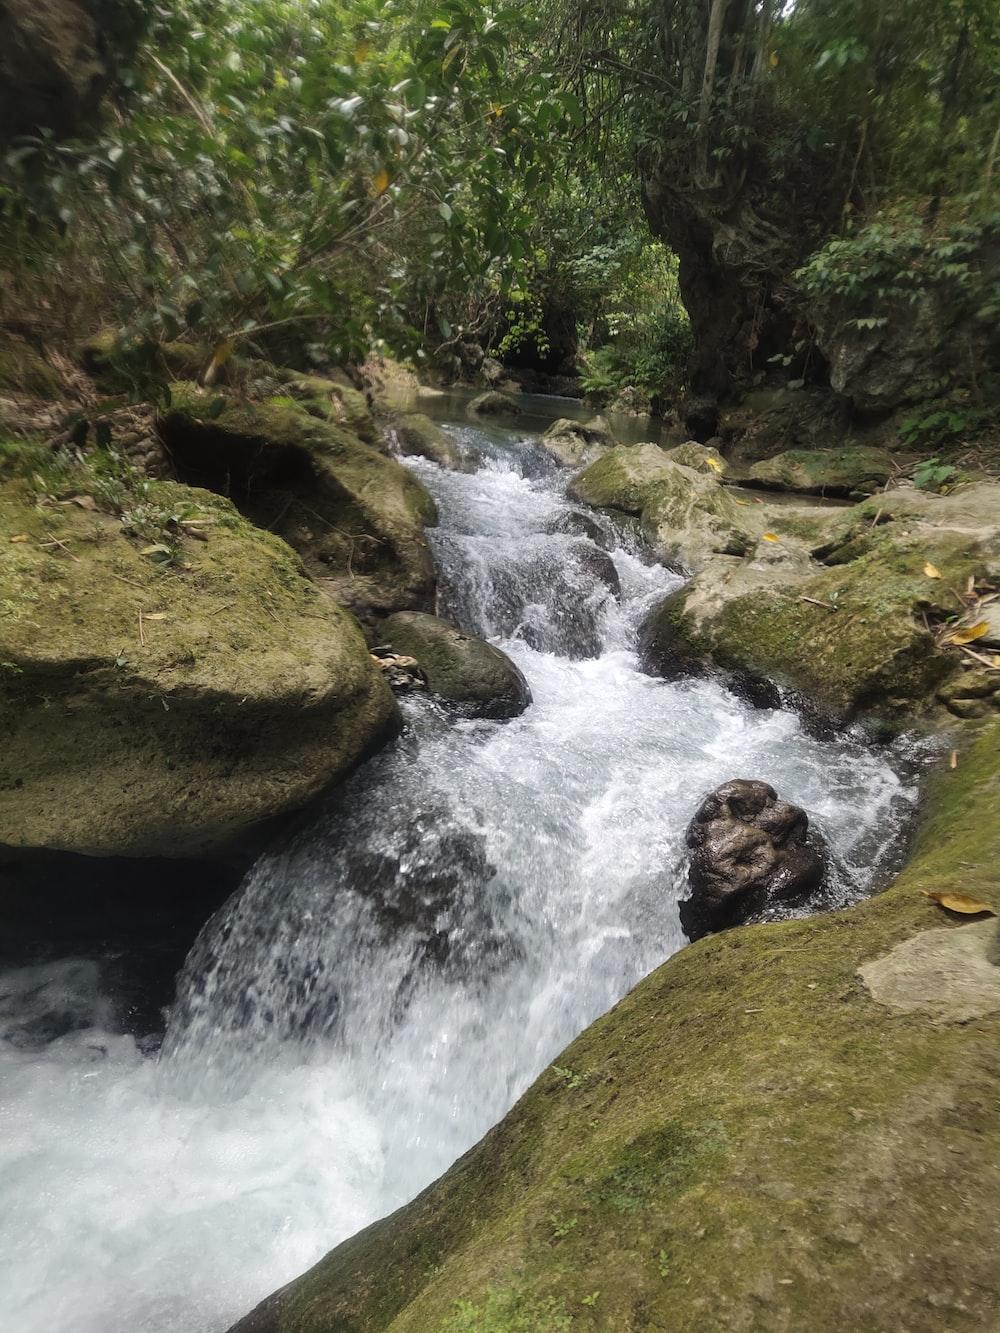 river in between rocks on forestt